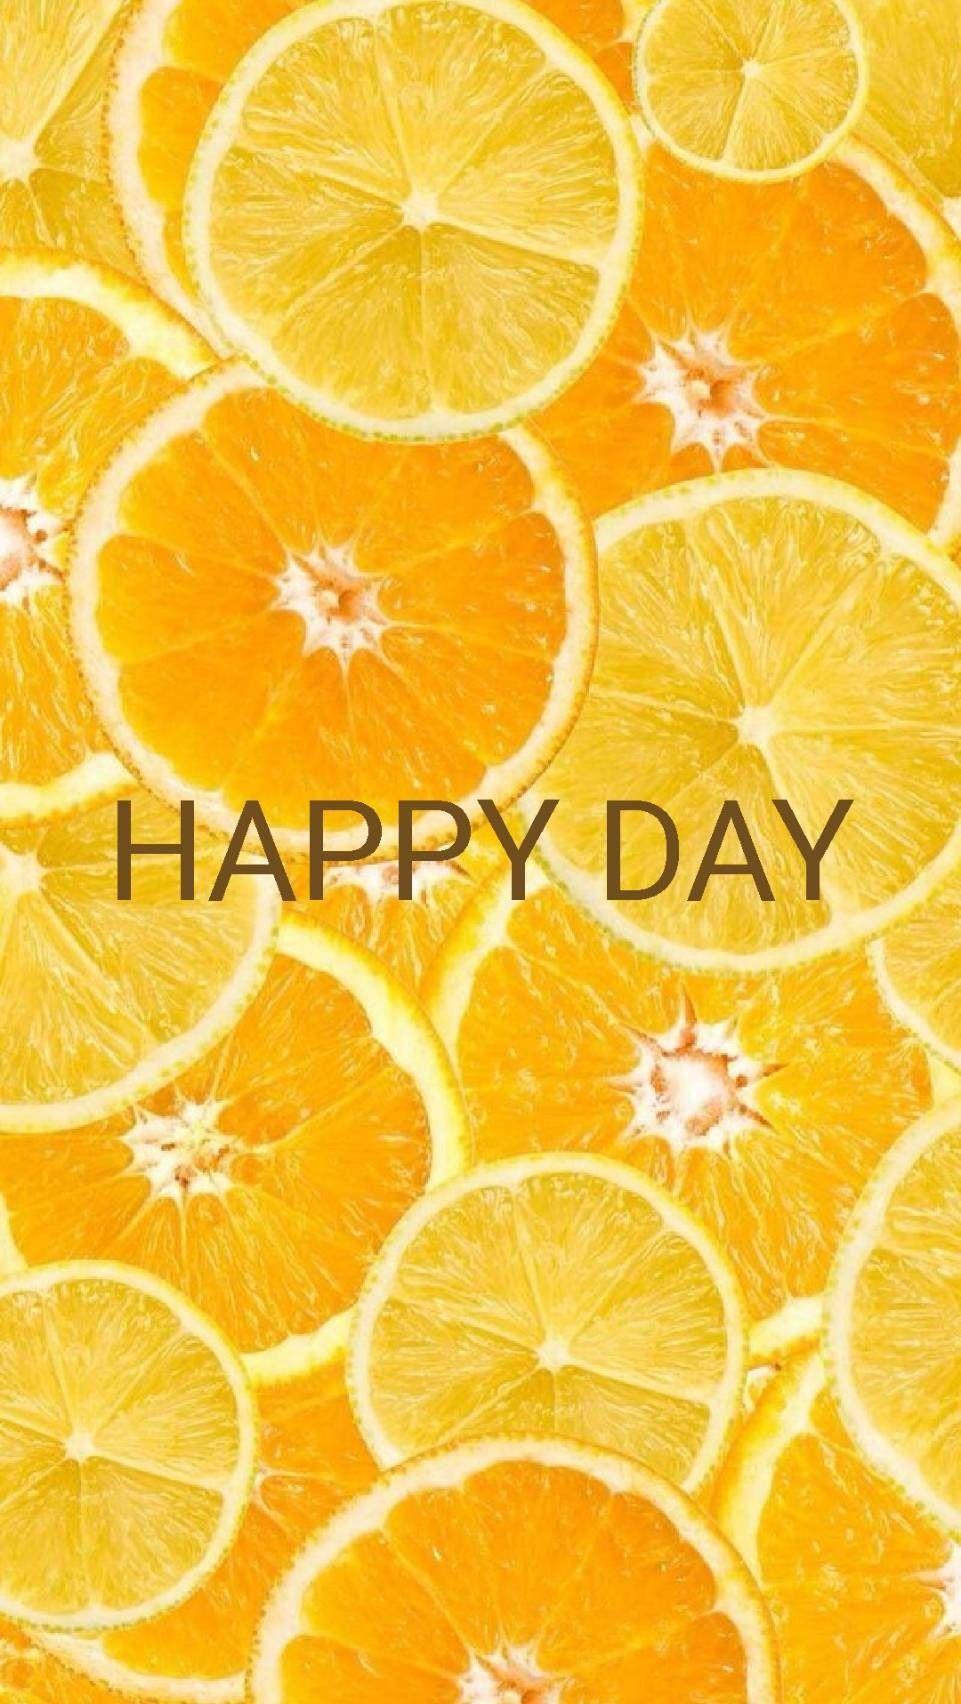 Happy Monday おしゃれまとめの人気アイデア Pinterest Pu